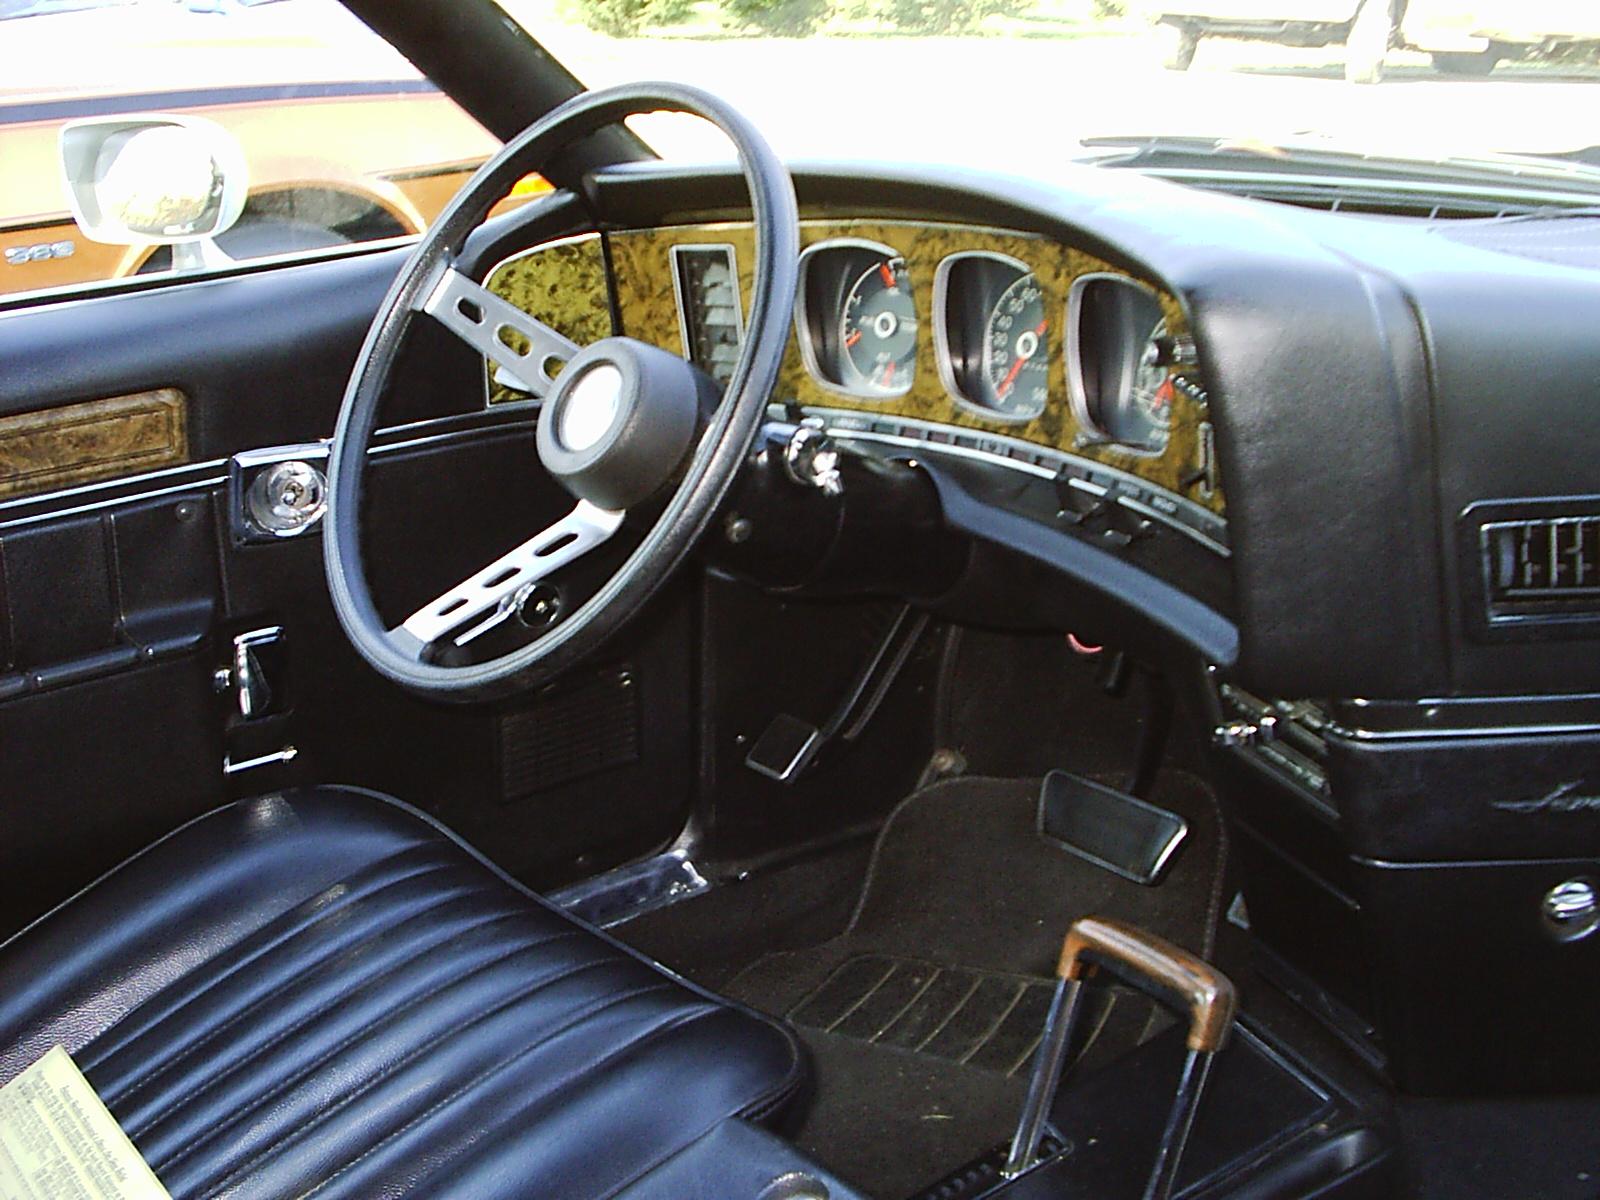 1968 Amc Javelin Interior Shows The Javelin's Drivercentered Interior